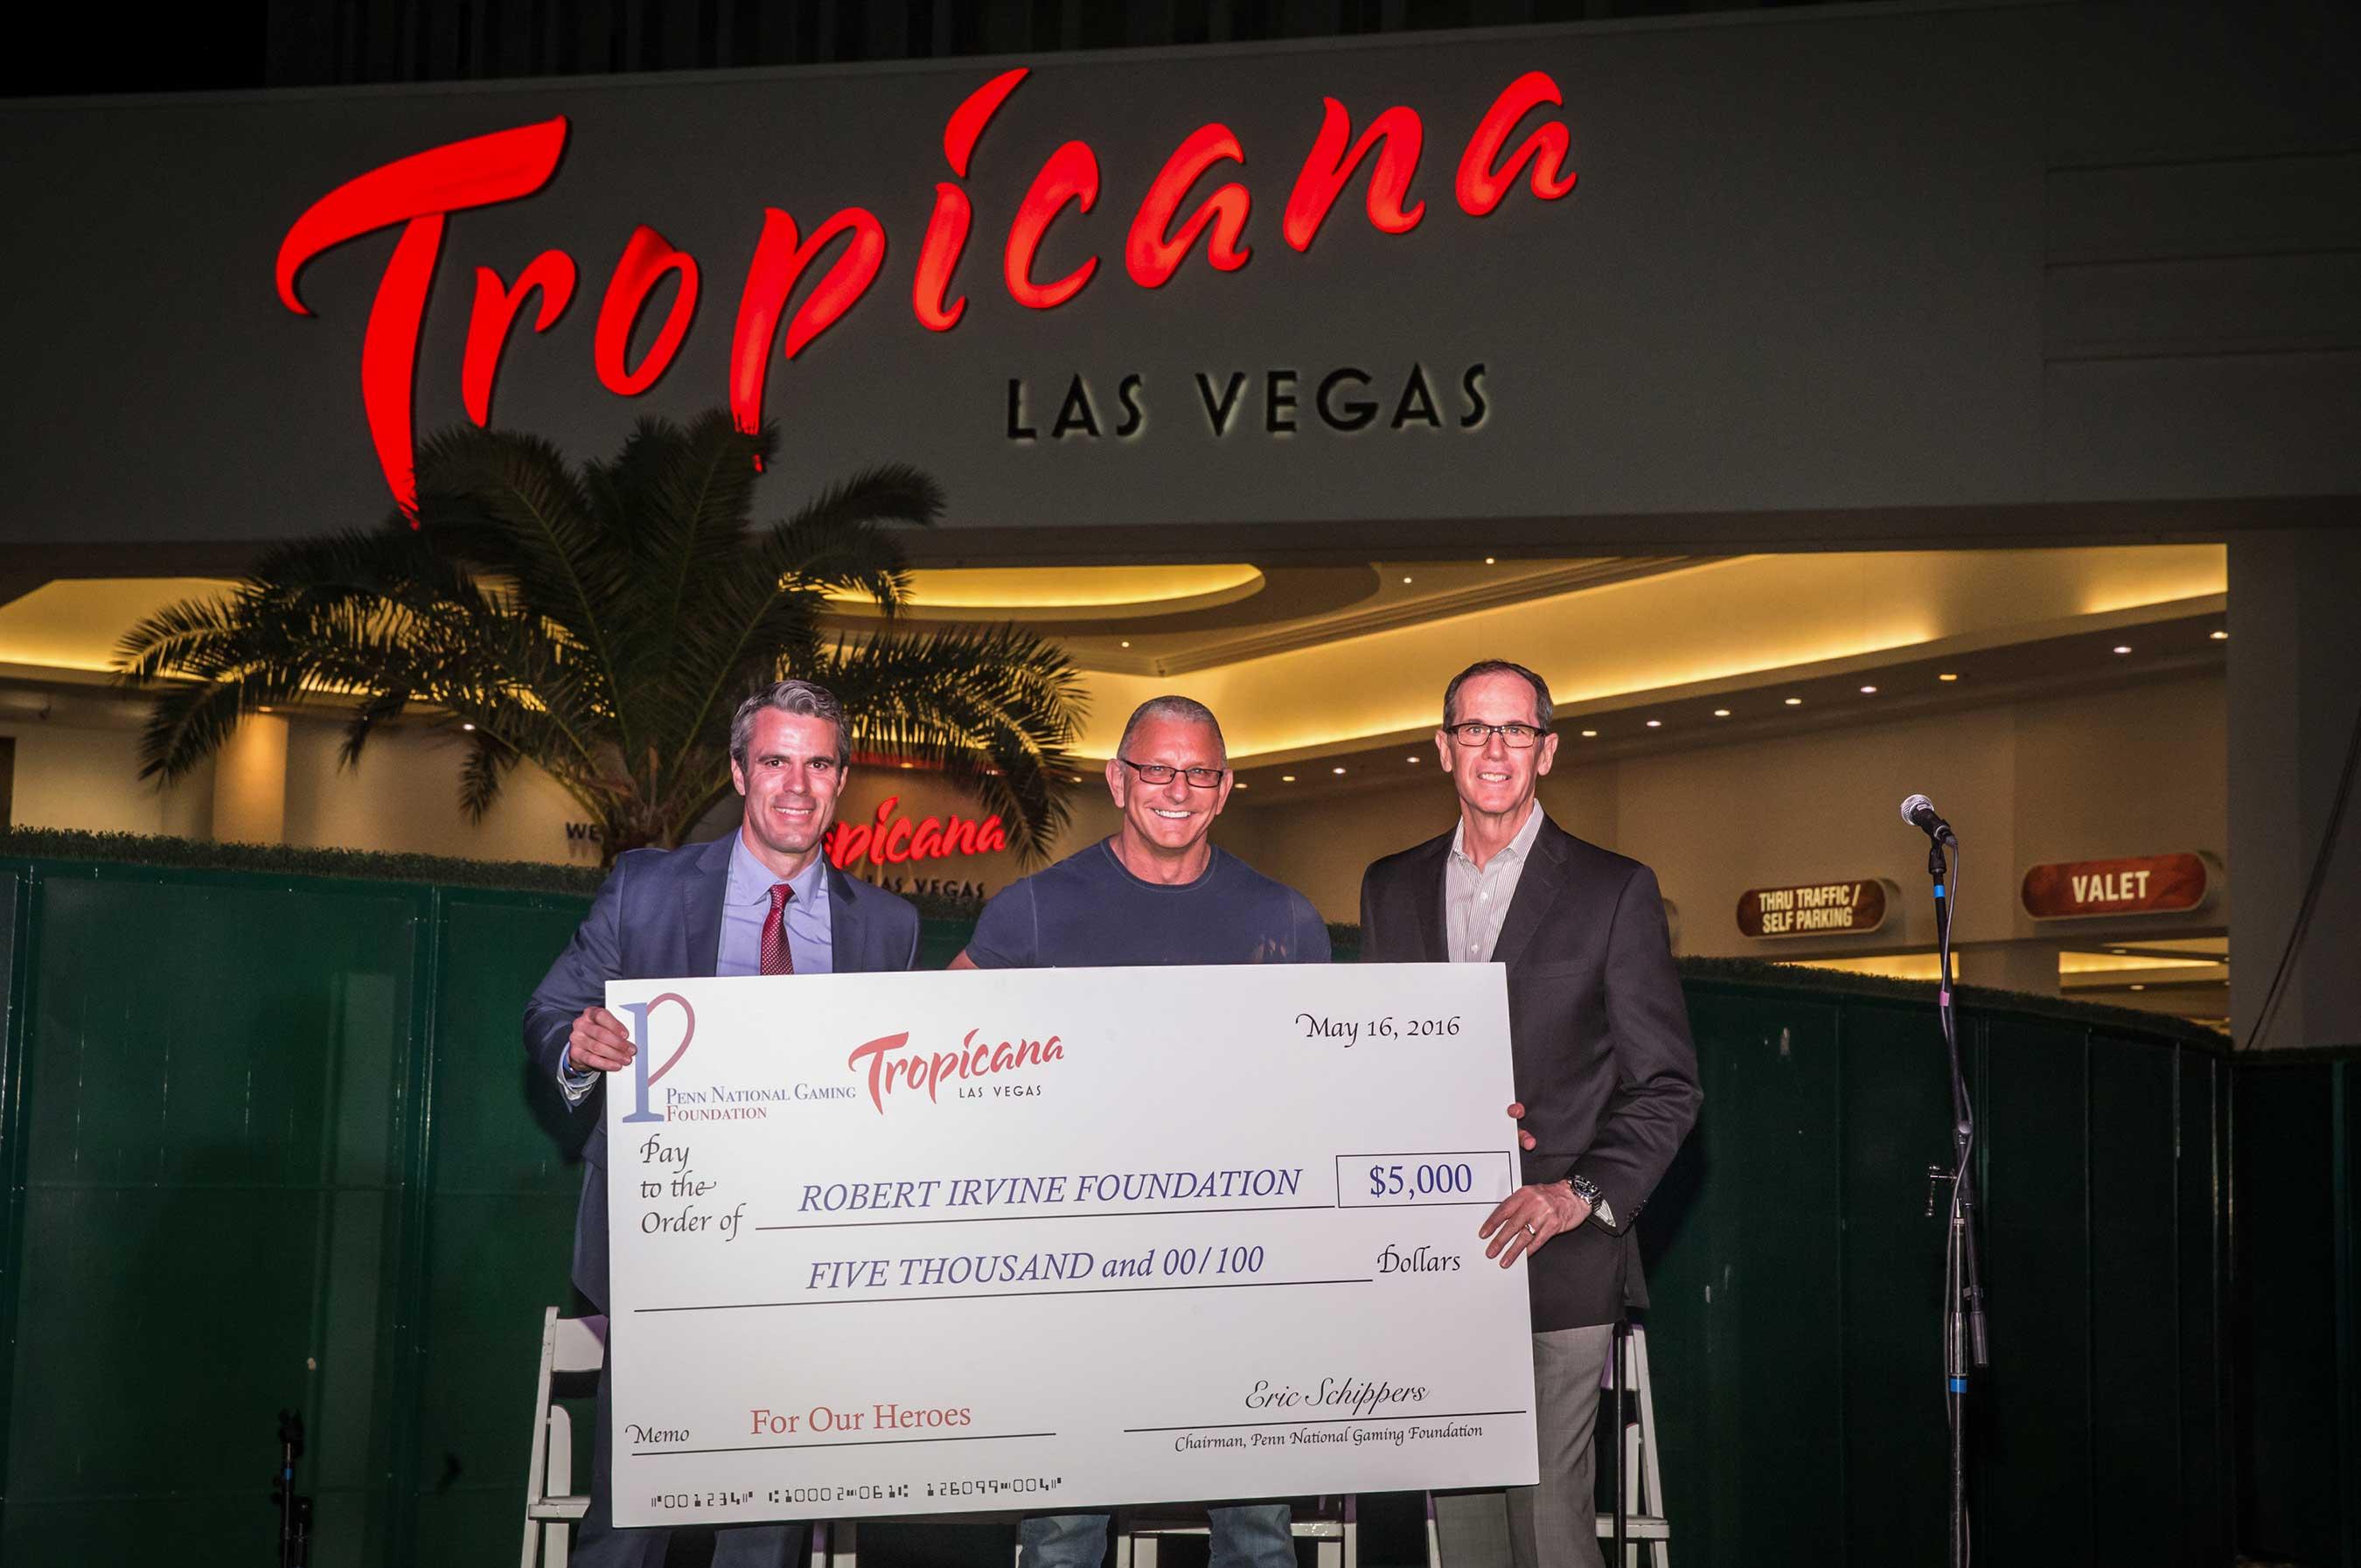 Tropicana Las Vegas presents Chef Irvine with a $5,000 check   Credit: Erik Kabik Photography/ MediaPunch